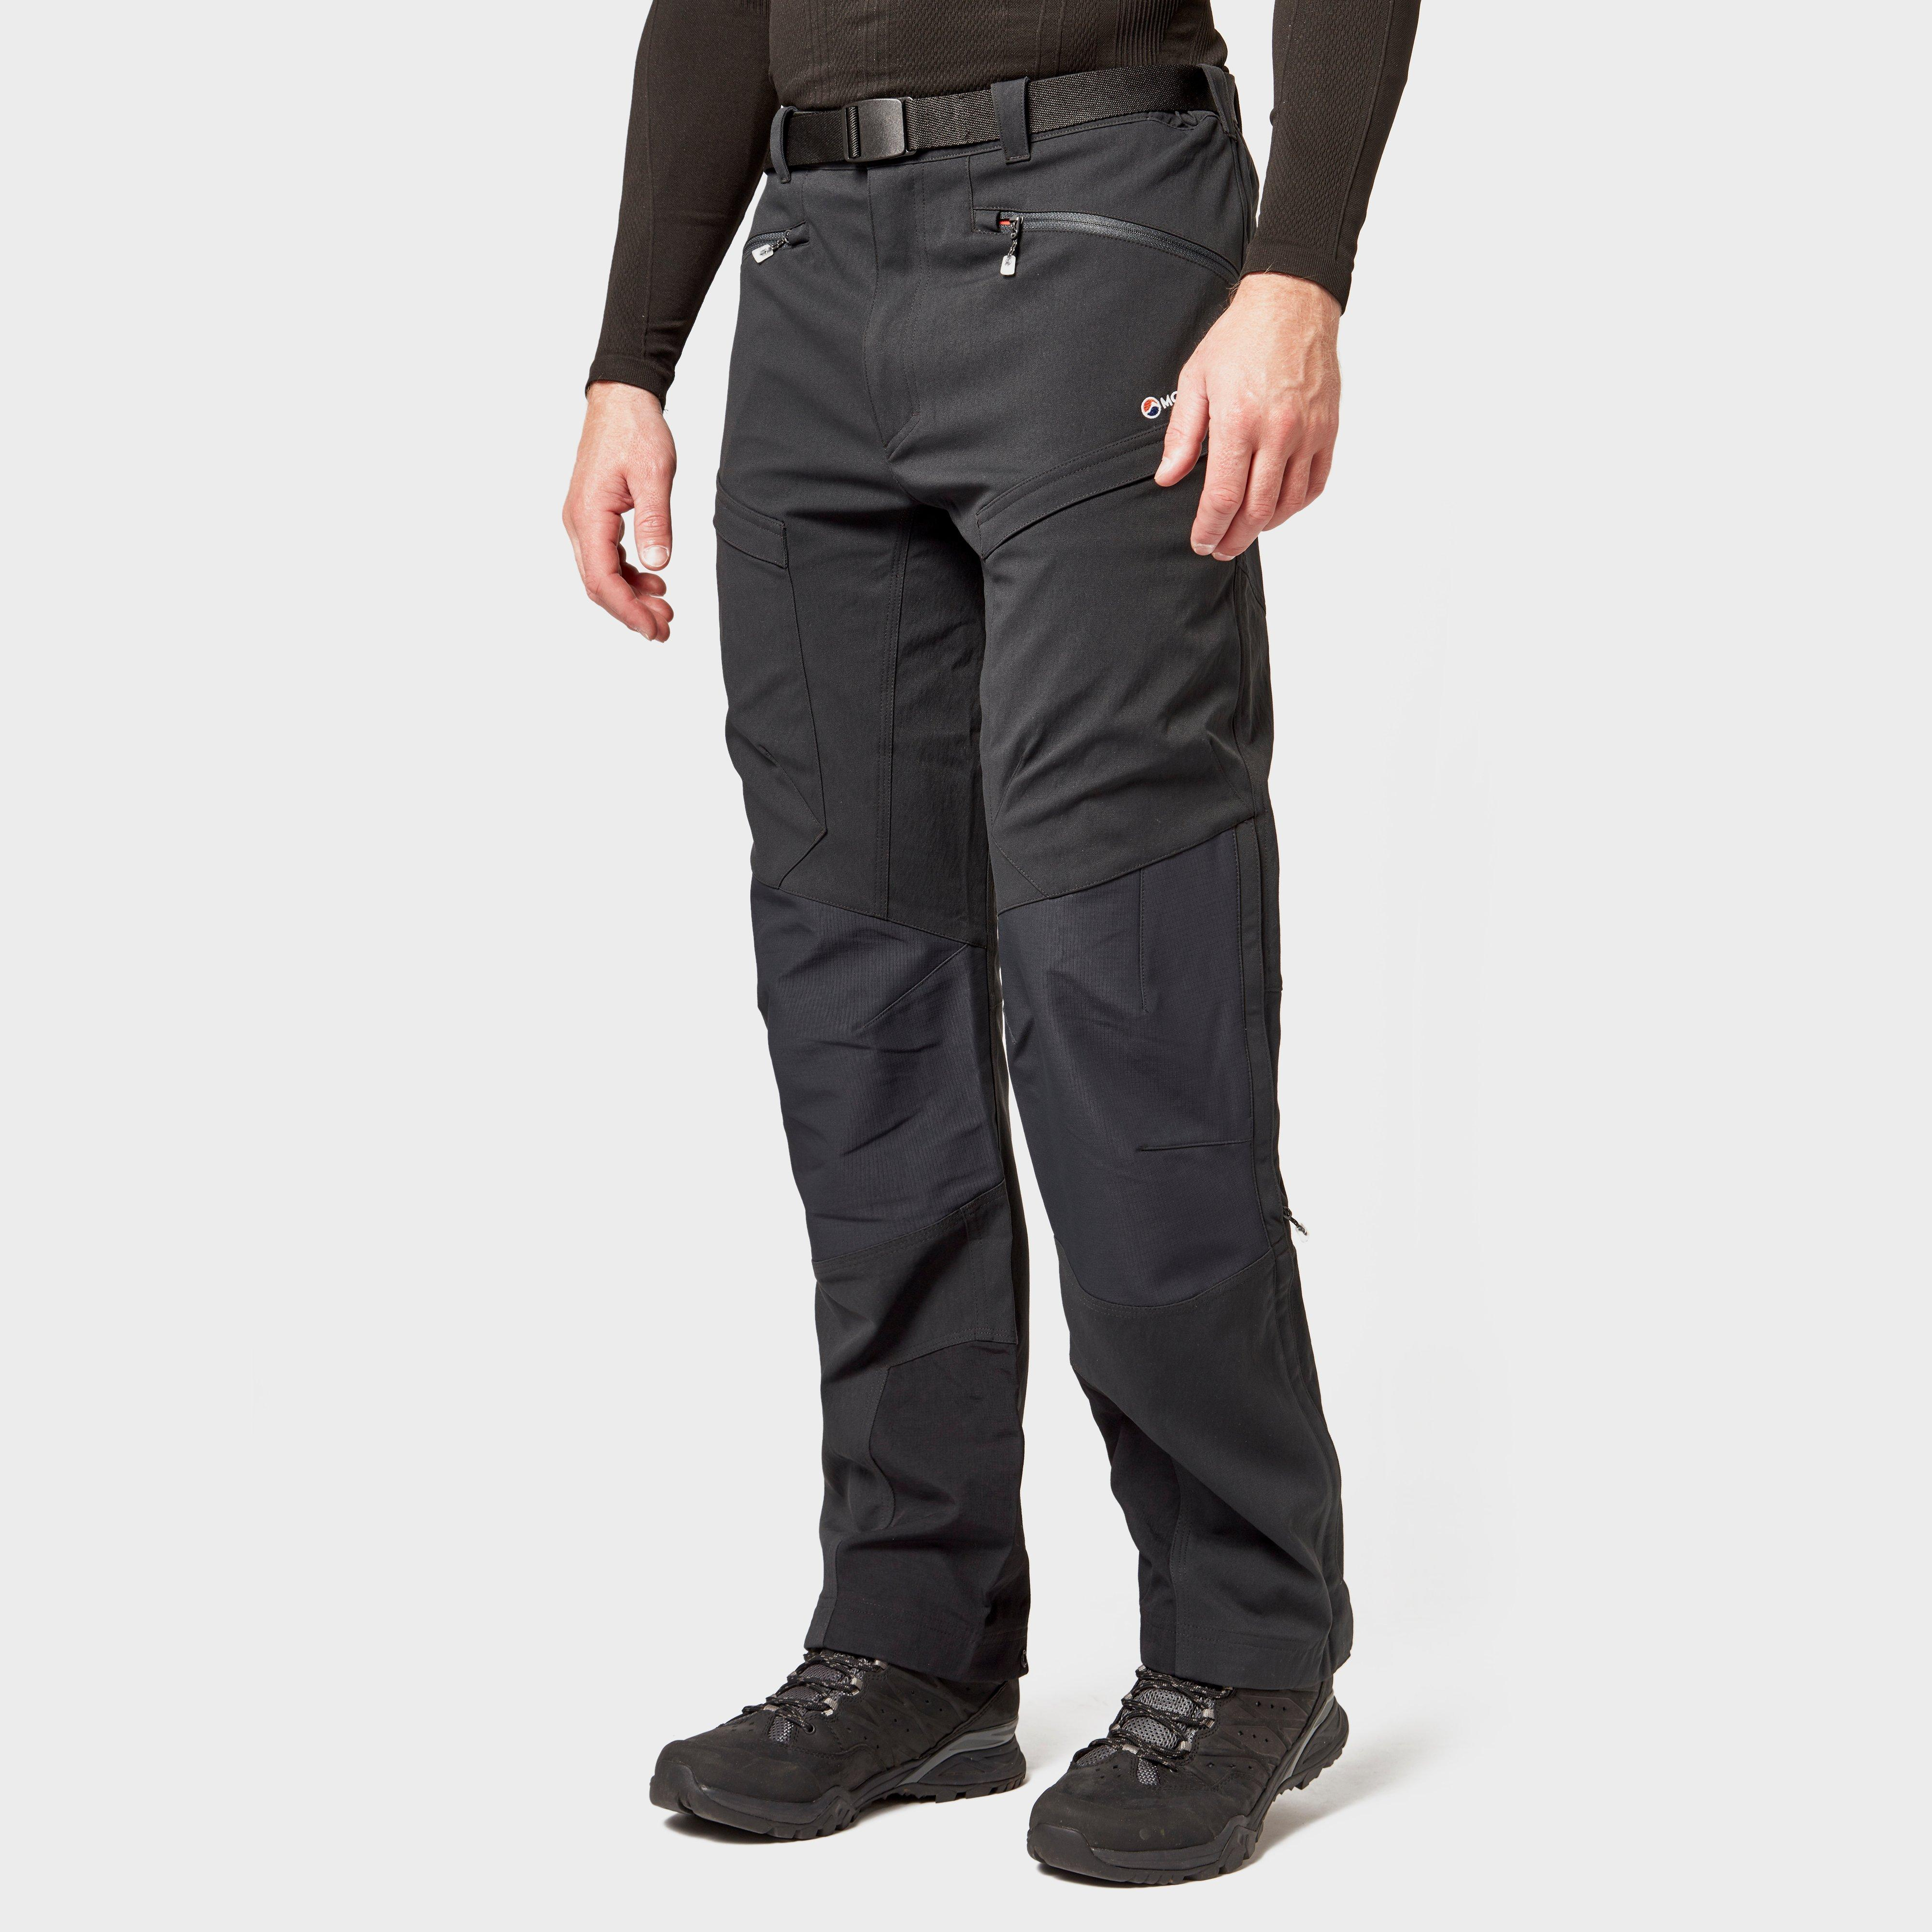 Montane Montane Mens Super Terra Pants - Black, Black